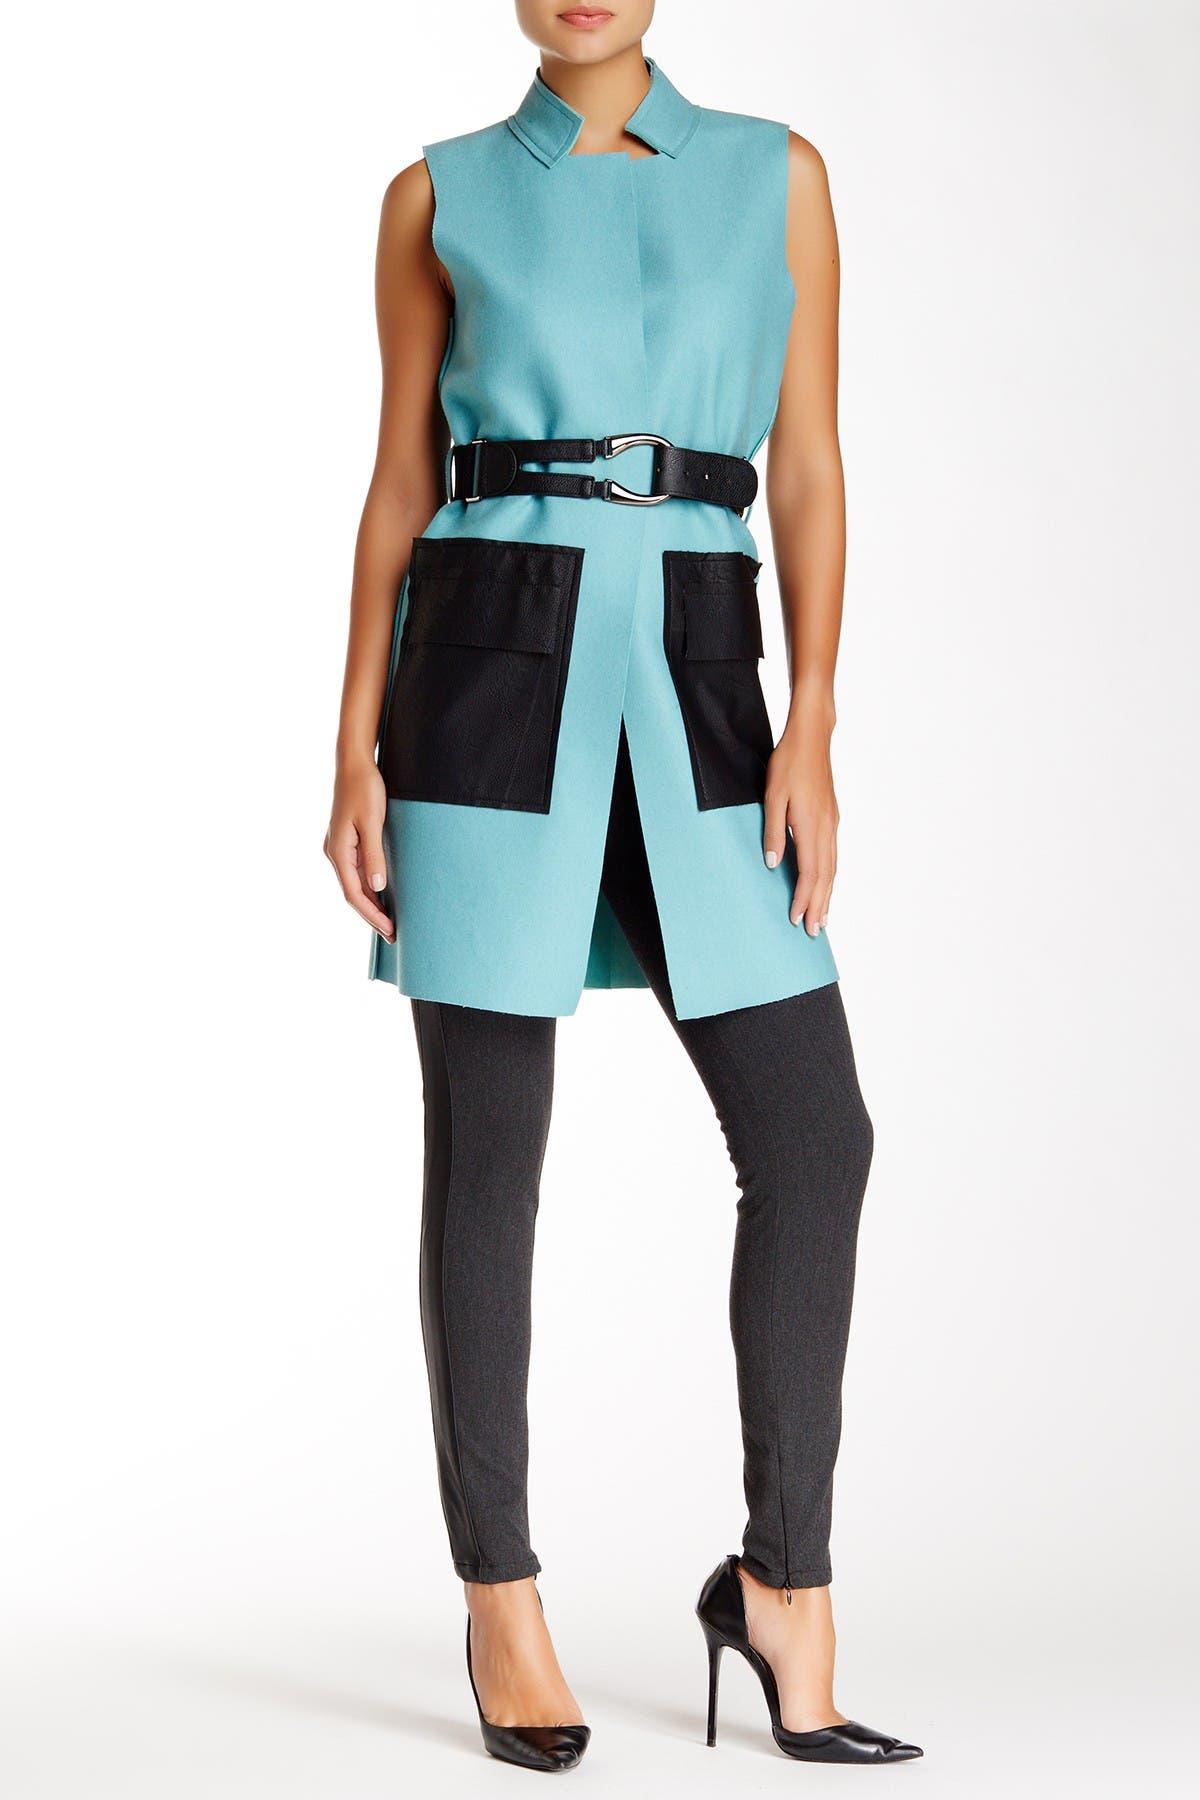 Image of Gracia Faux Leather Trim Wool Blend Longline Vest